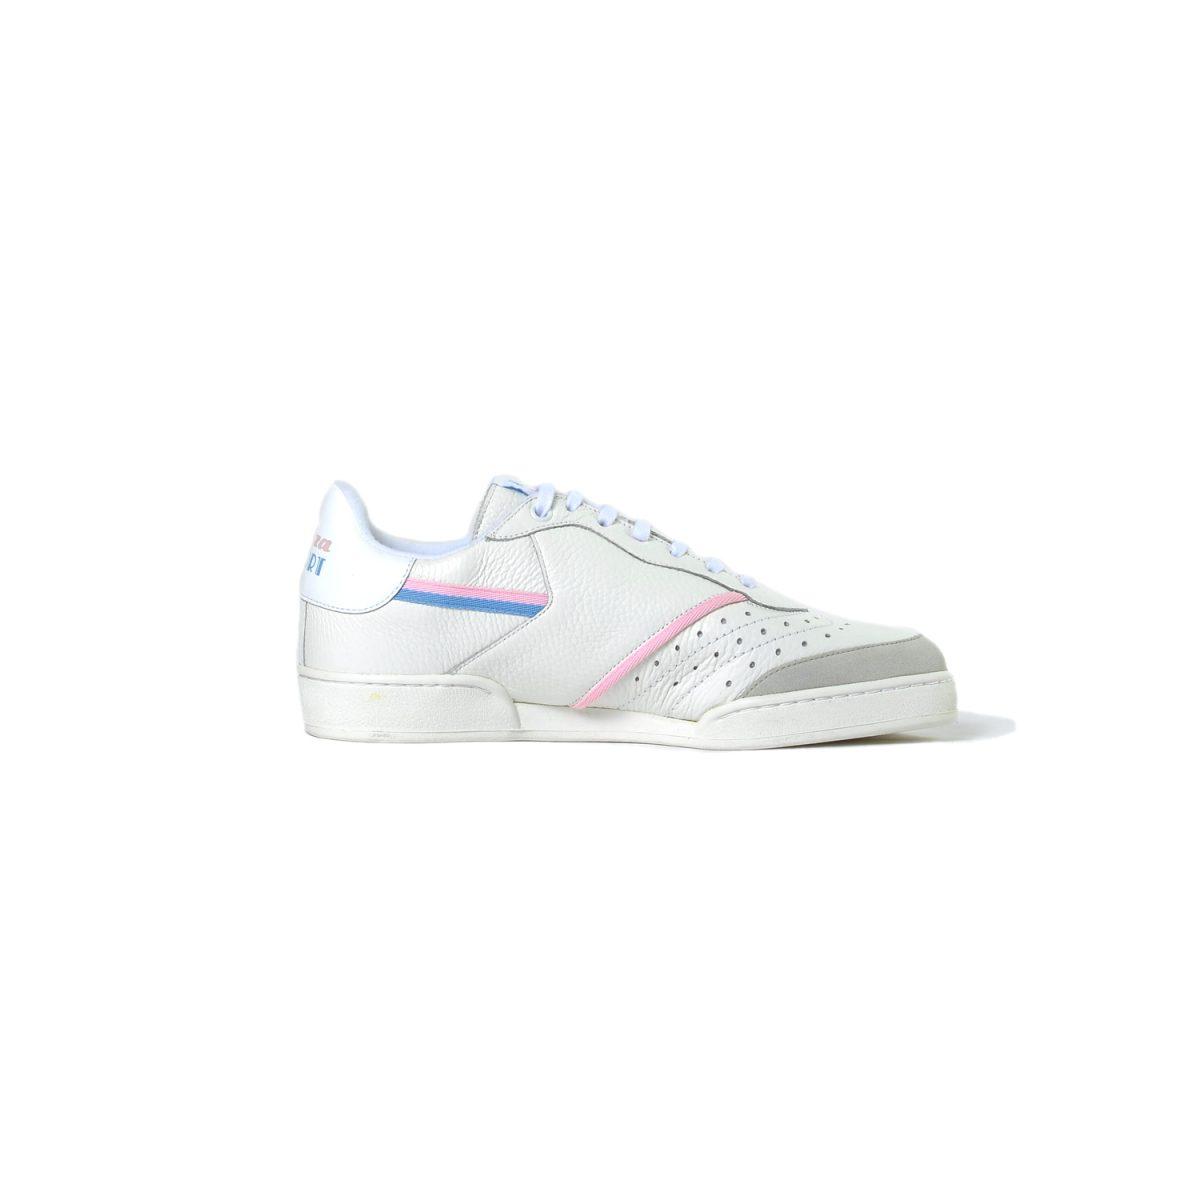 Tisza shoes - Sport - White-blue-pink